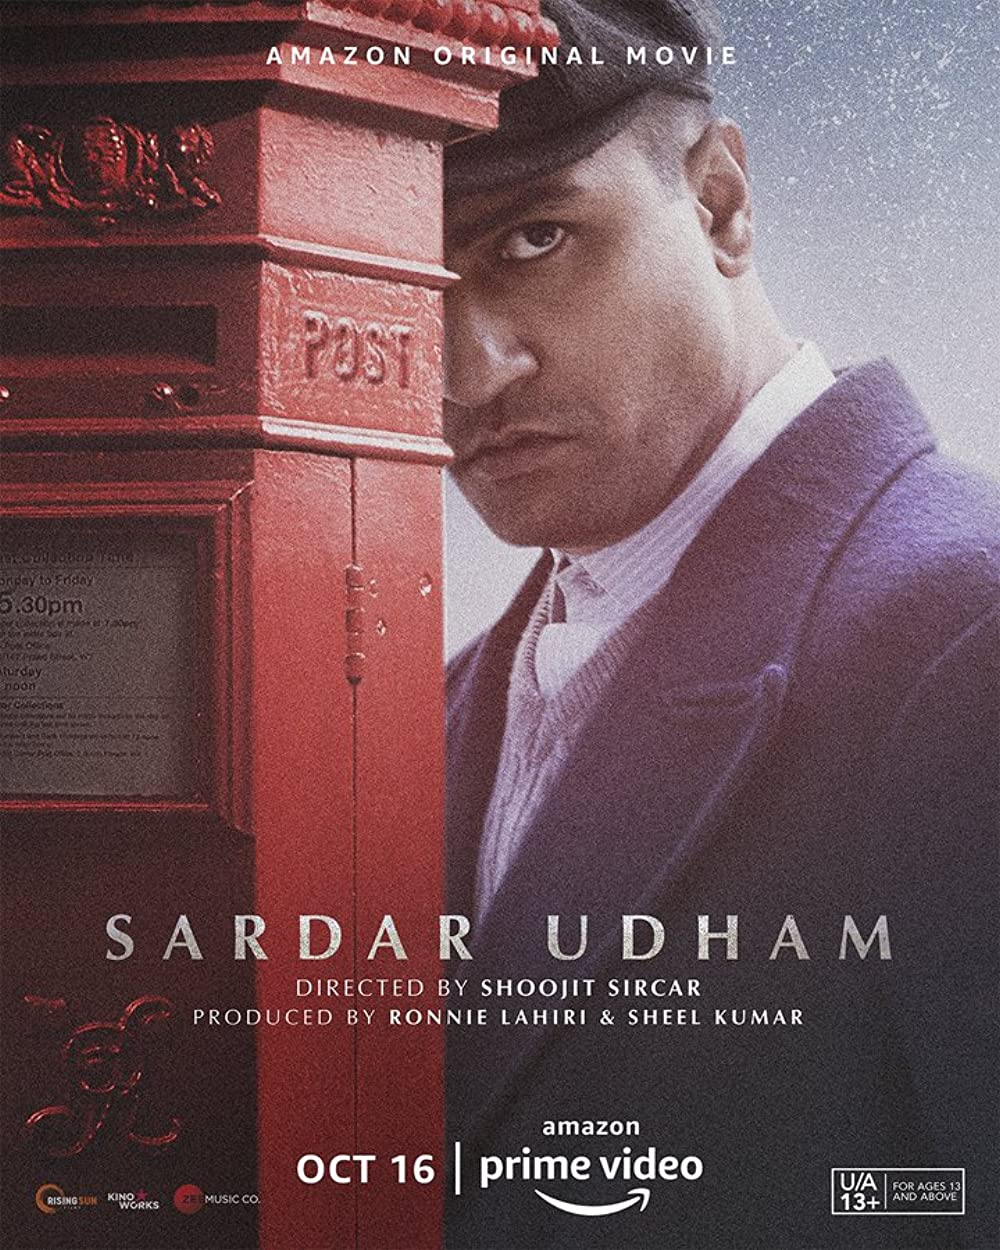 Sardar Udham 2021 Hindi Movie 600MB AMZN HDRip 720p | 480p HEVC x265 ESubs Download